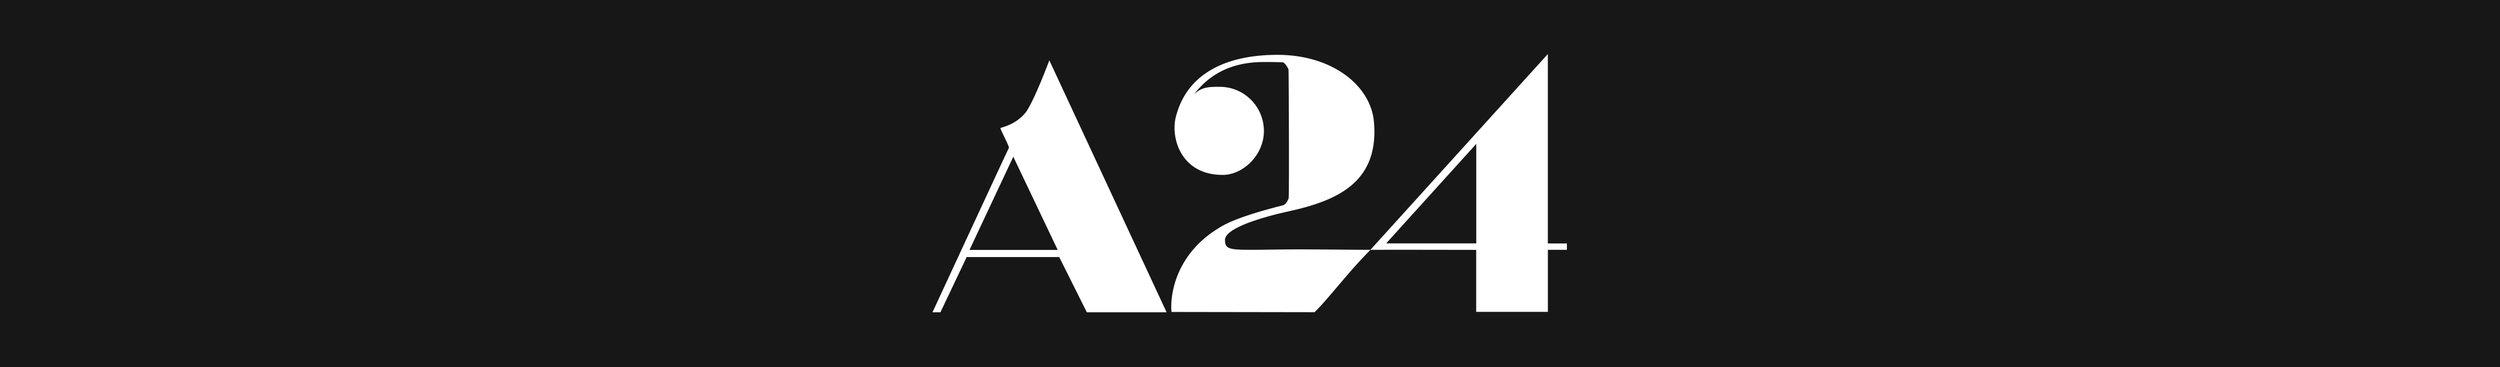 Intermission_Logo_White_A24.jpg